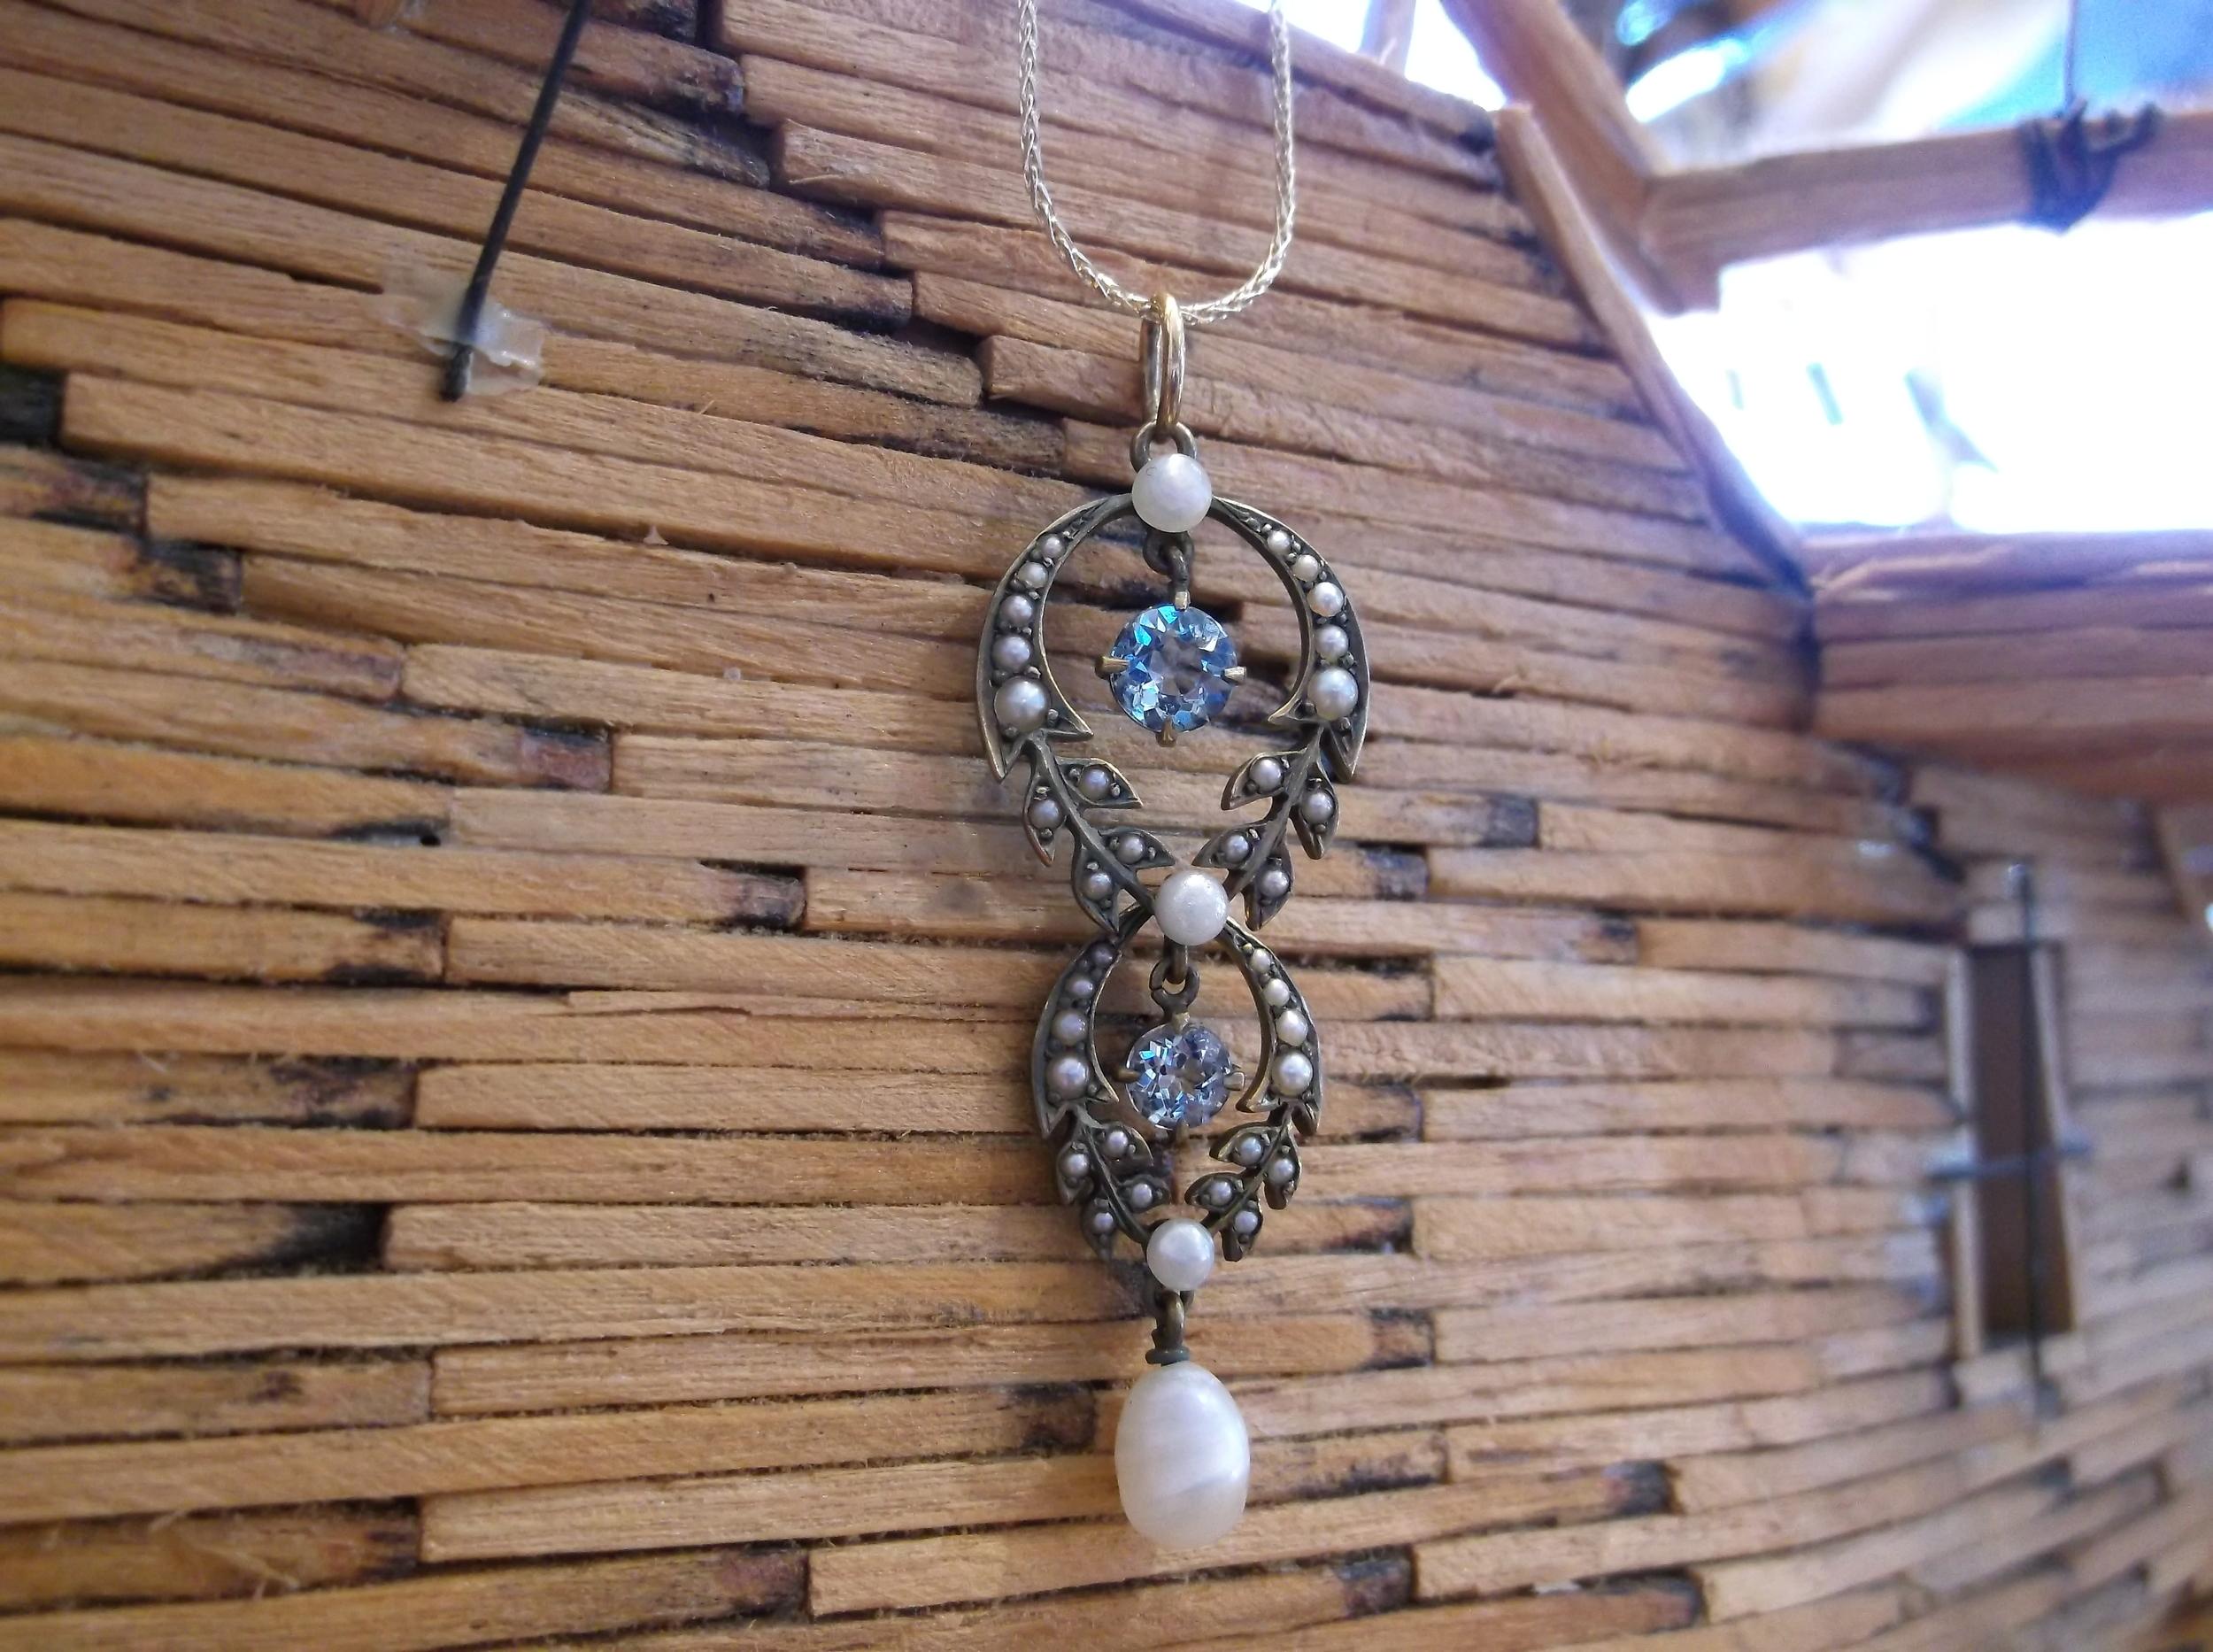 SOLD - Beautiful circa 1900's aquamarine and pearl pendant.